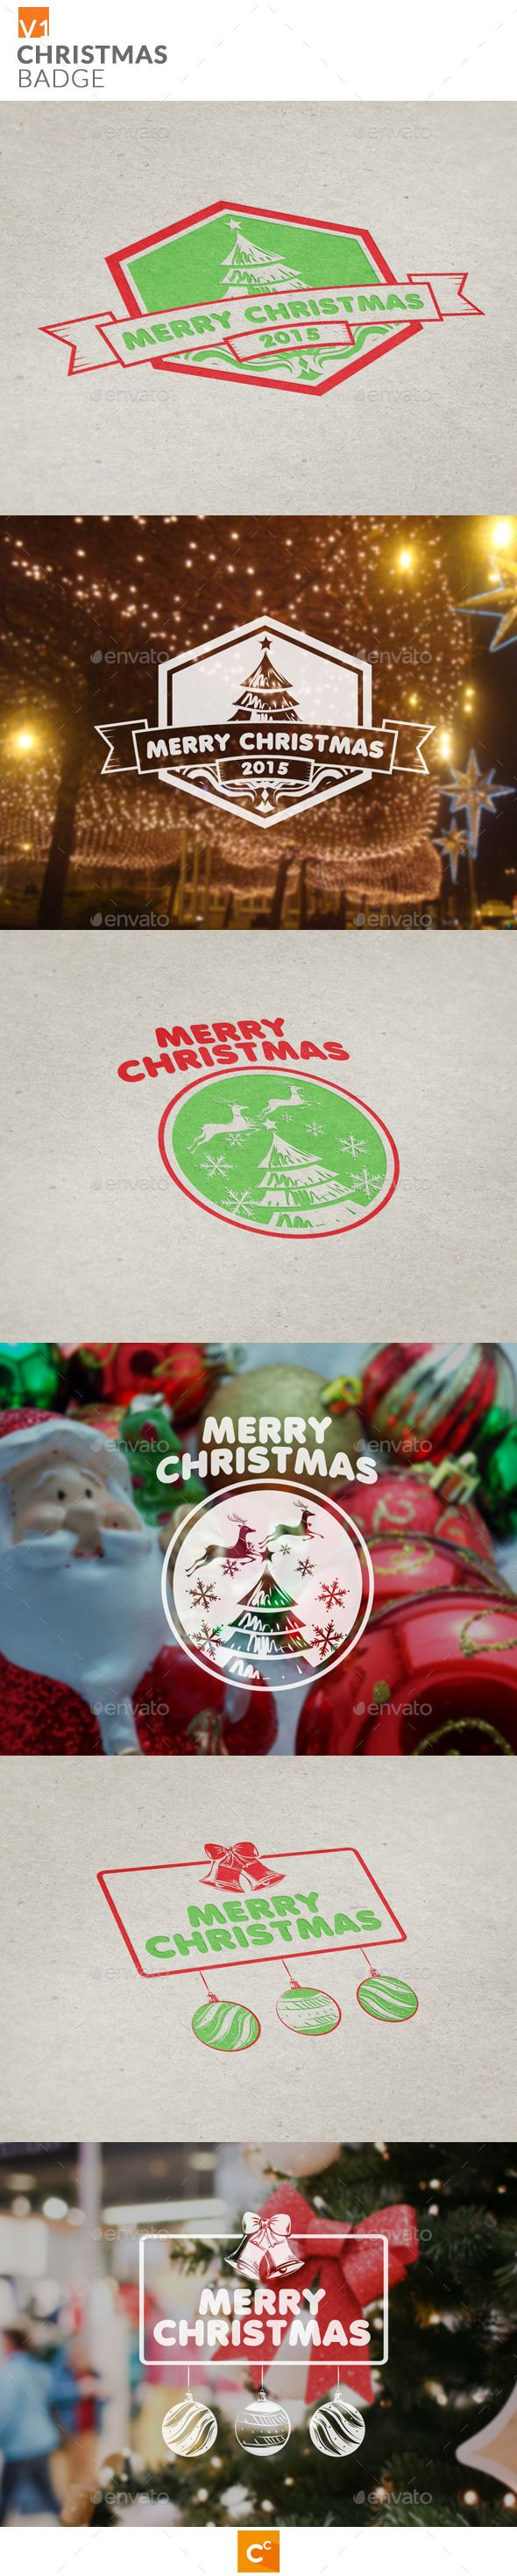 Christmas Badge | Buy and Download: http://graphicriver.net/item/christmas-badge/9774705?ref=ksioks